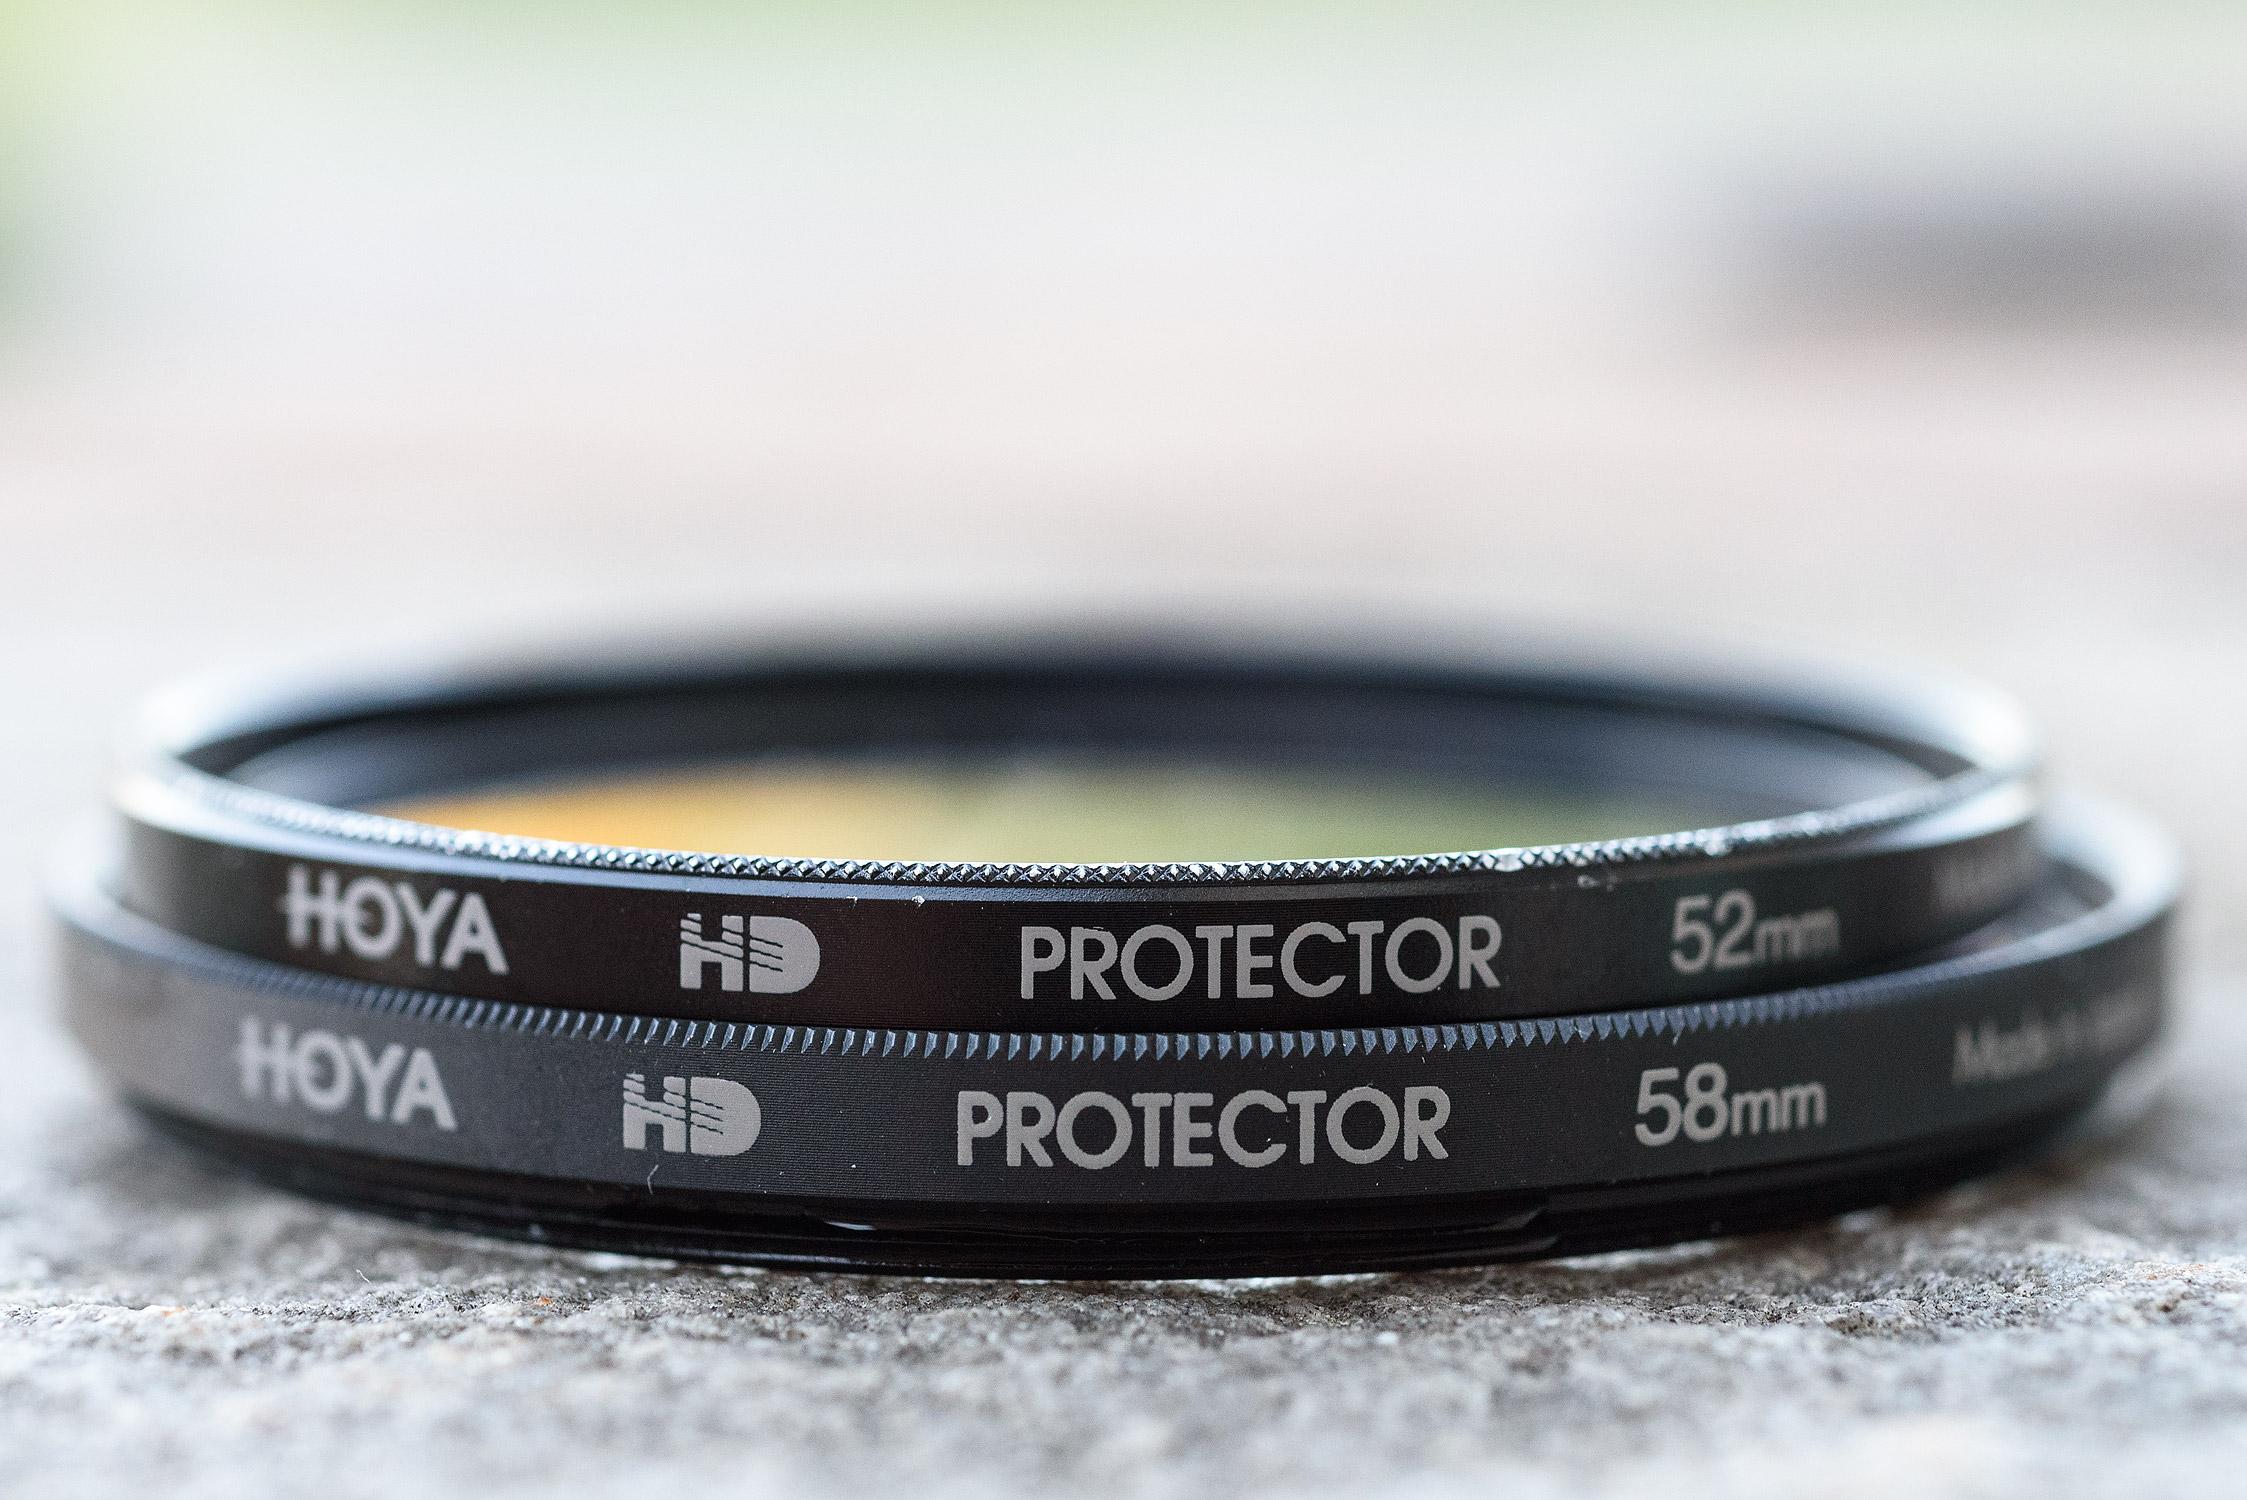 Top: Real Hoya HD. Bottom: HKdirect Counterfeit Hoya HD